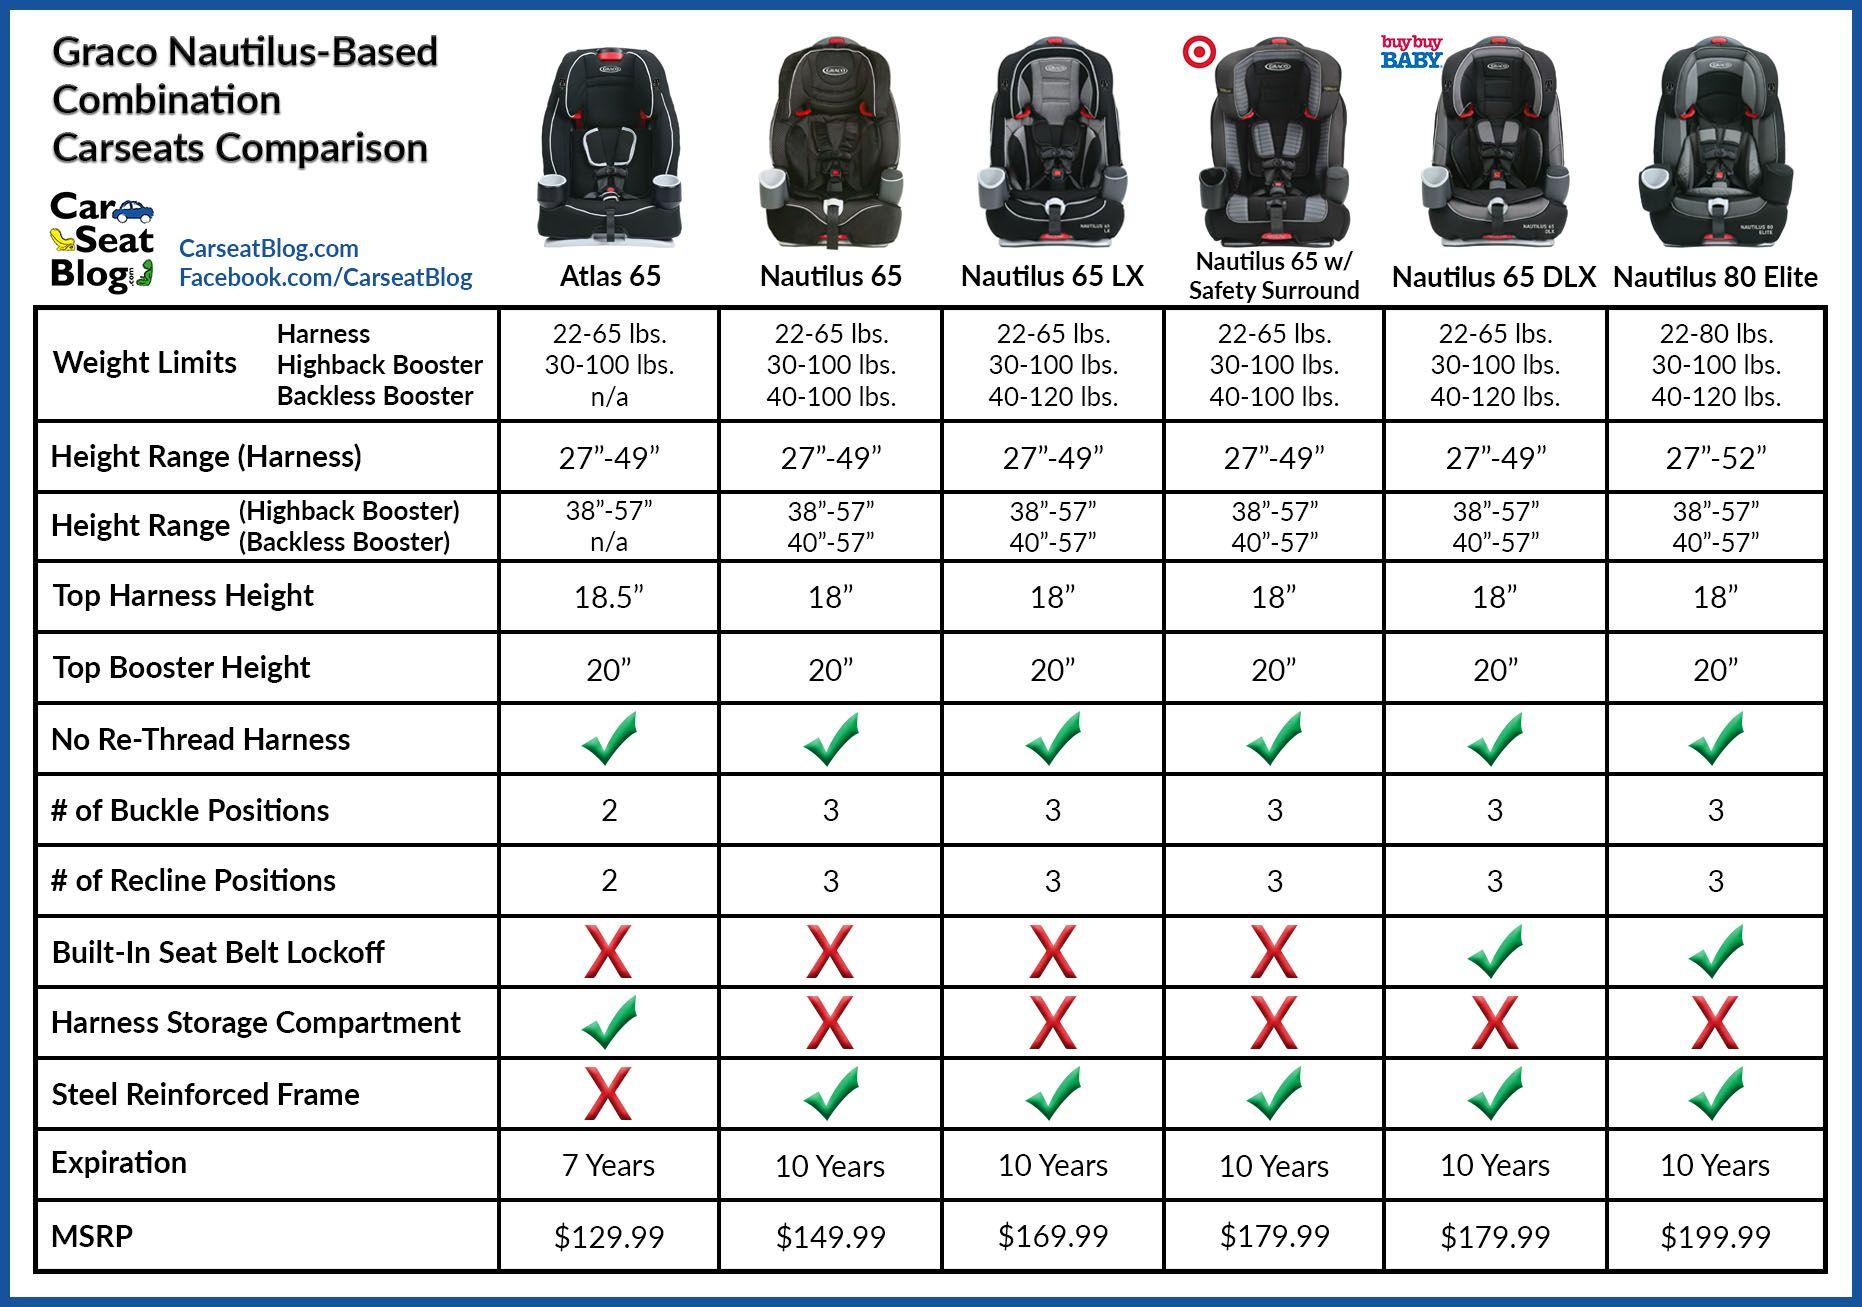 Graco Nautilus Based Combination Seats Comparison Graco Carseat